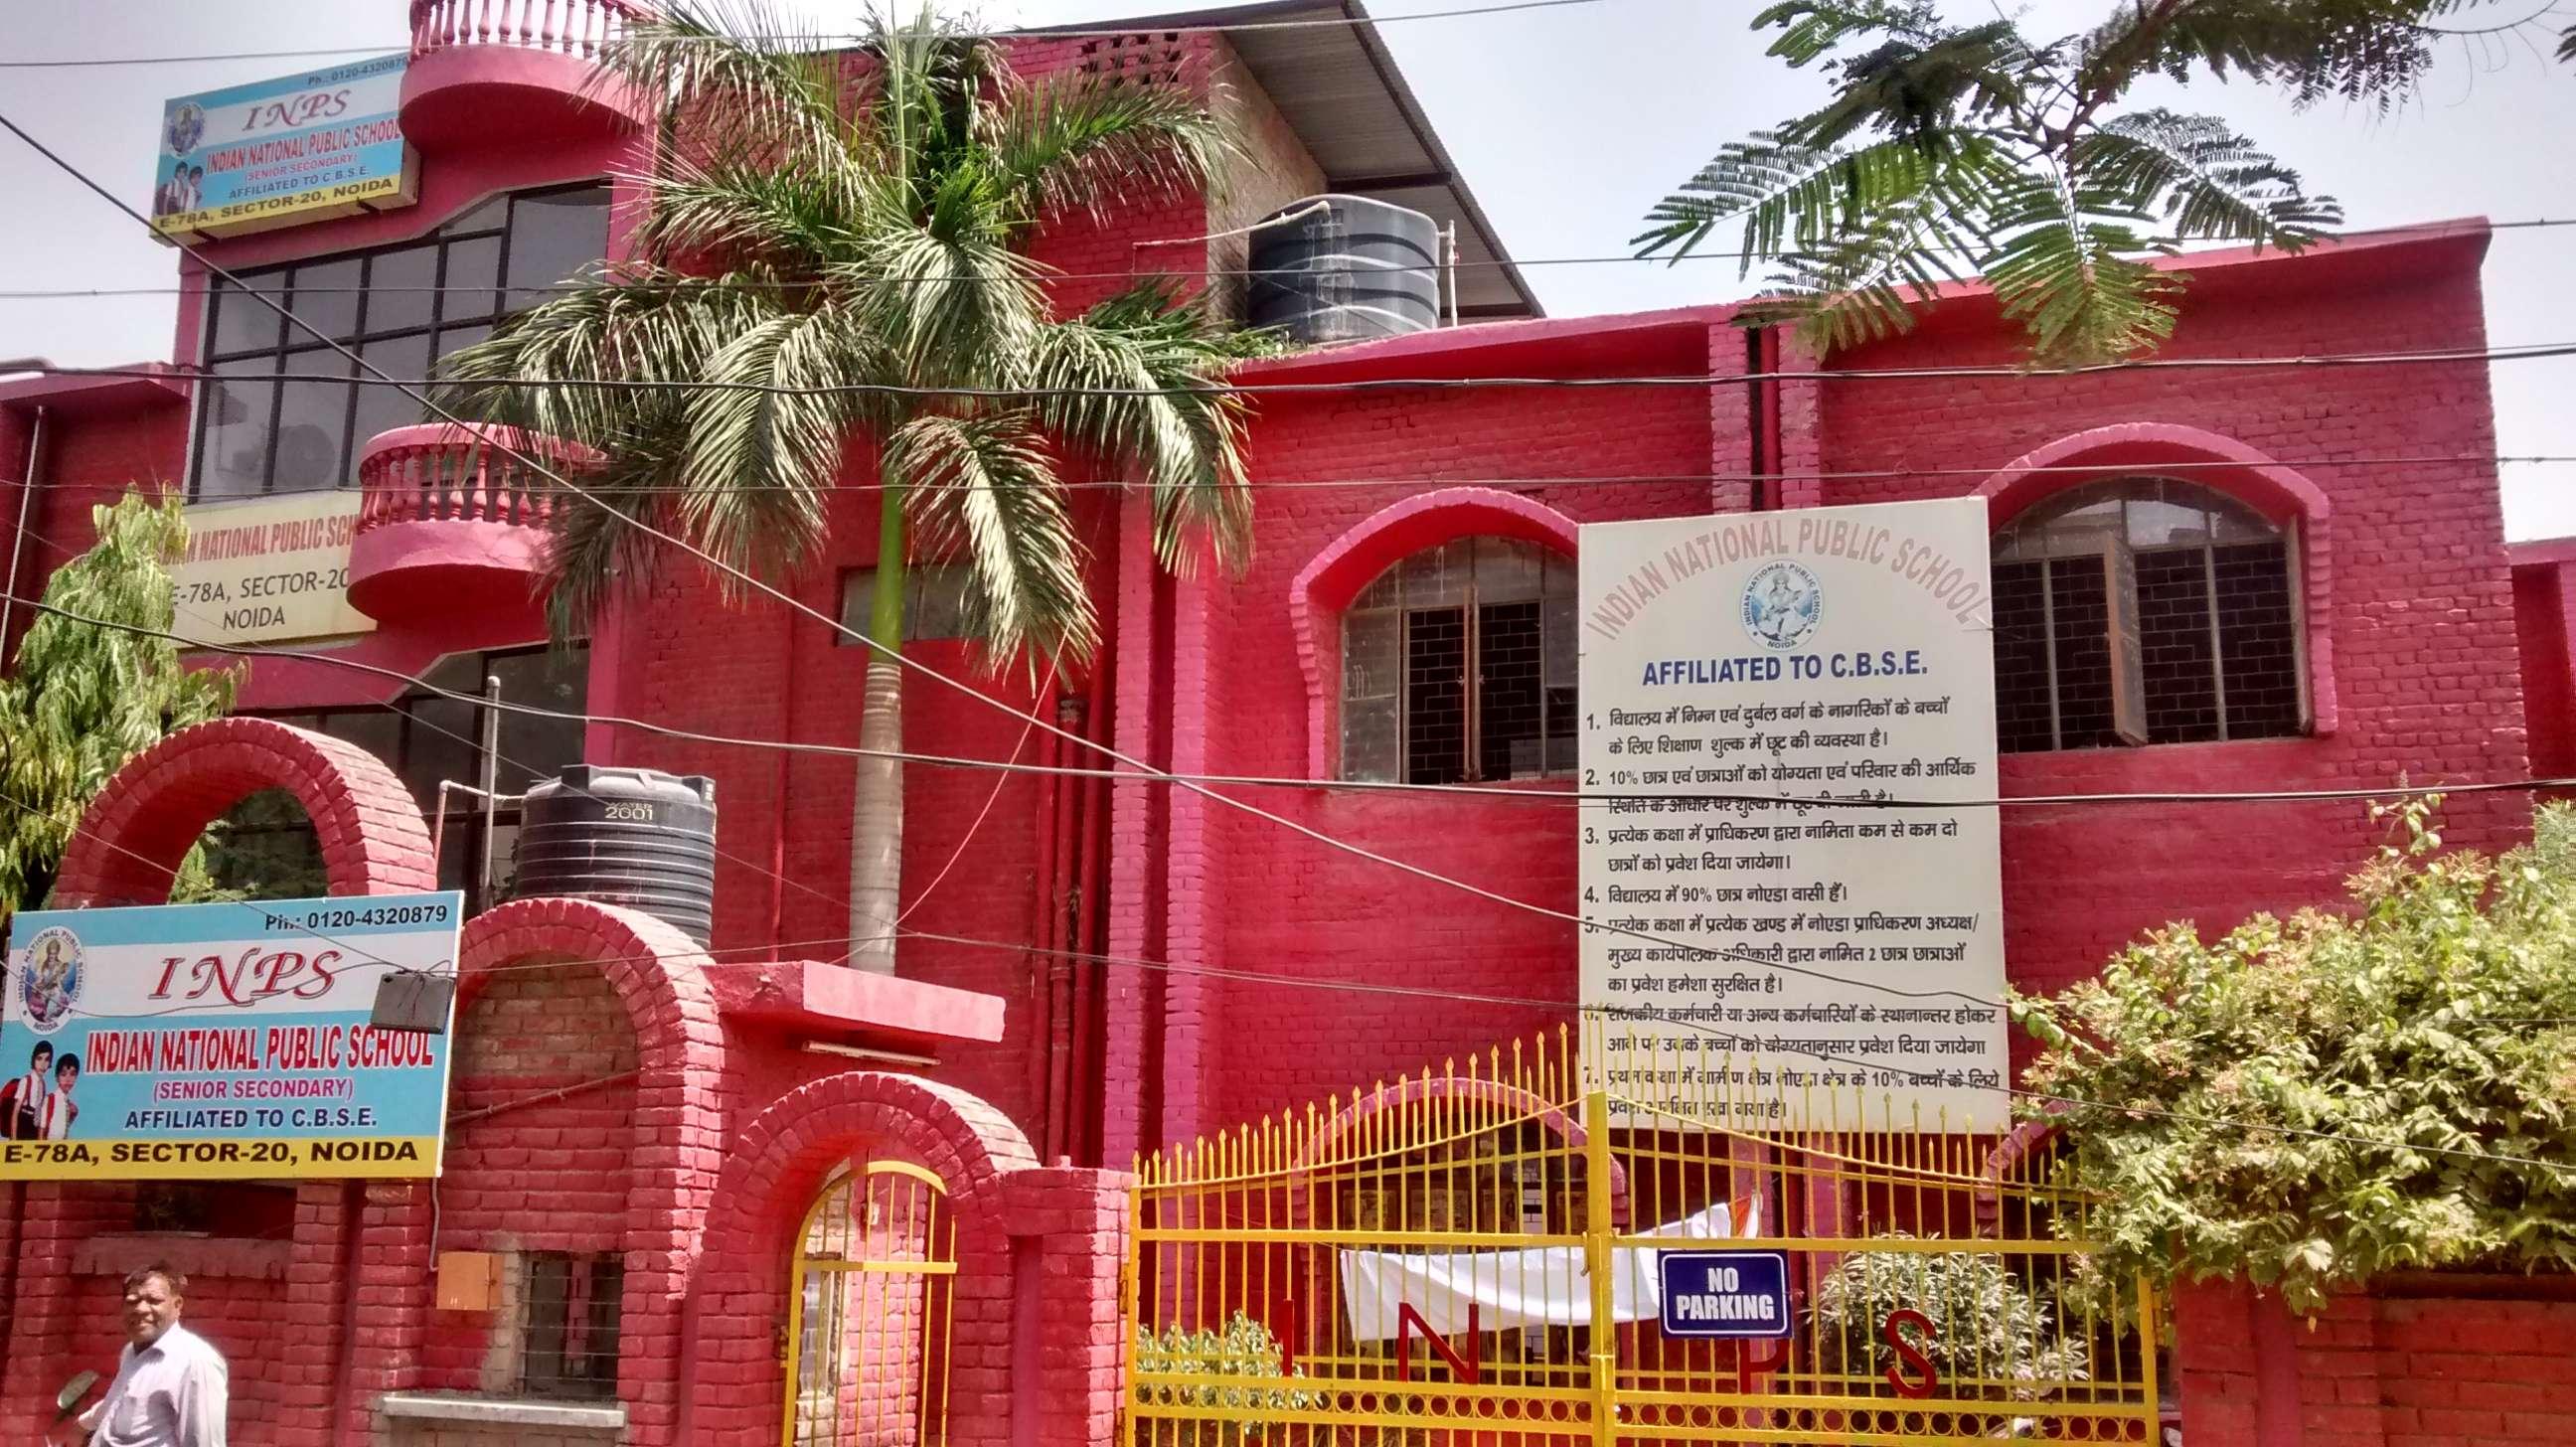 Indian National Public School E 78 A Sector 20 2131197